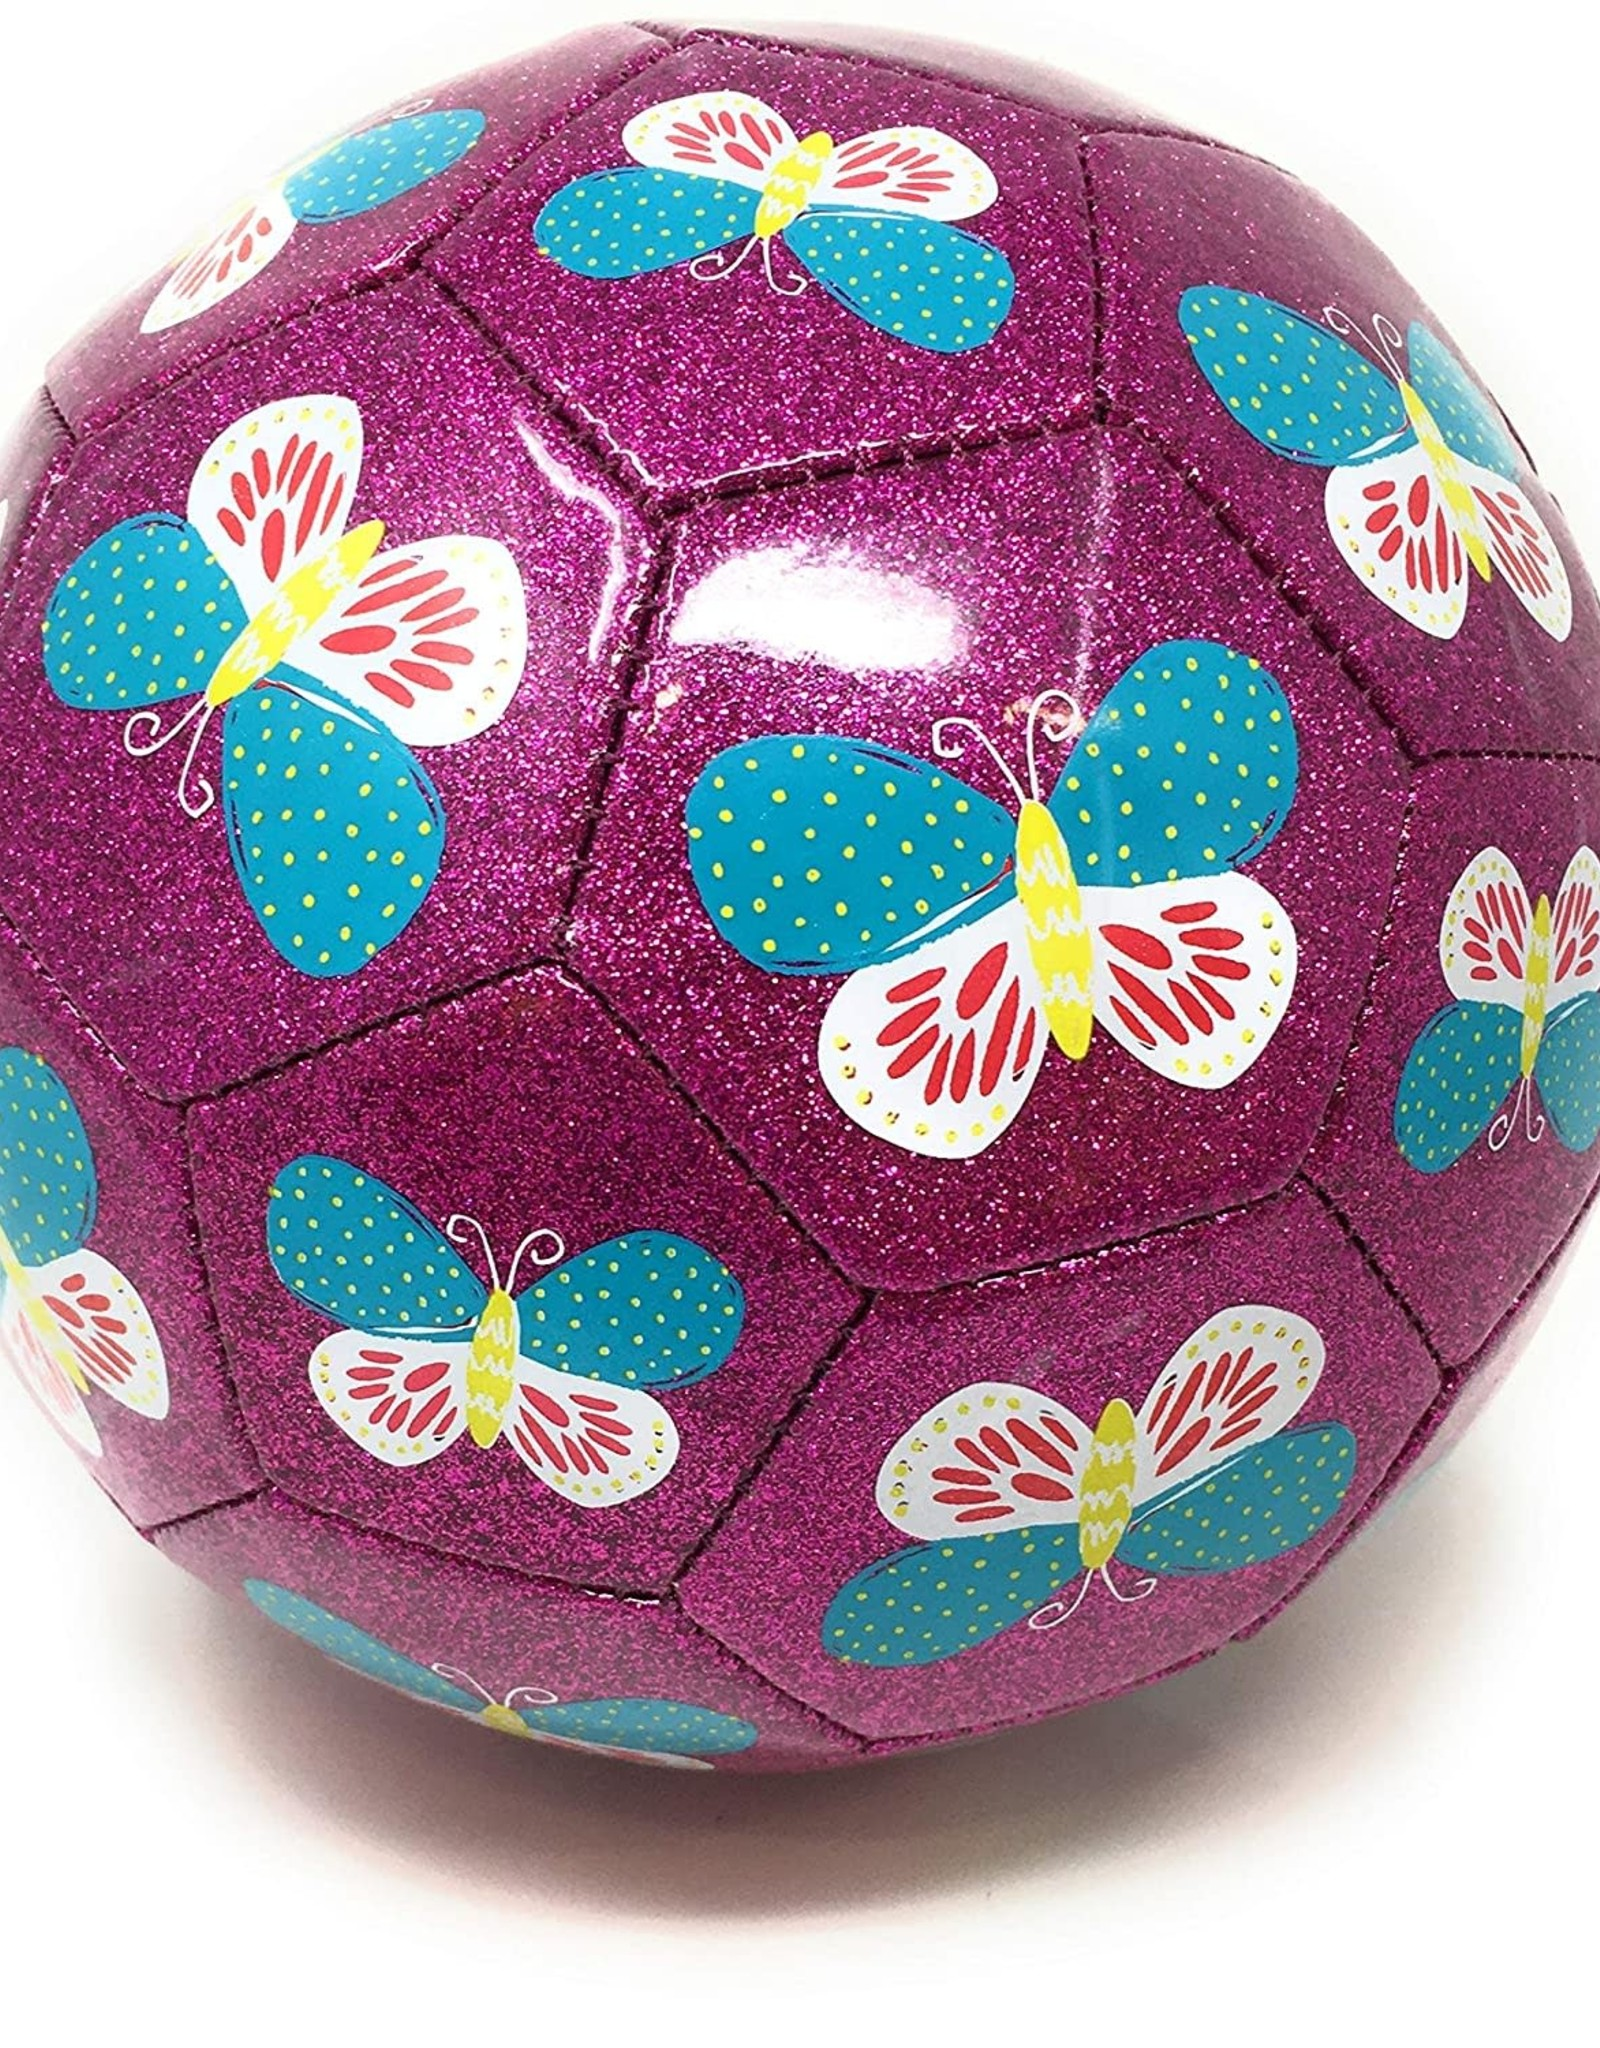 Crocodile Creek Glitter Soccer Ball - Butterfly